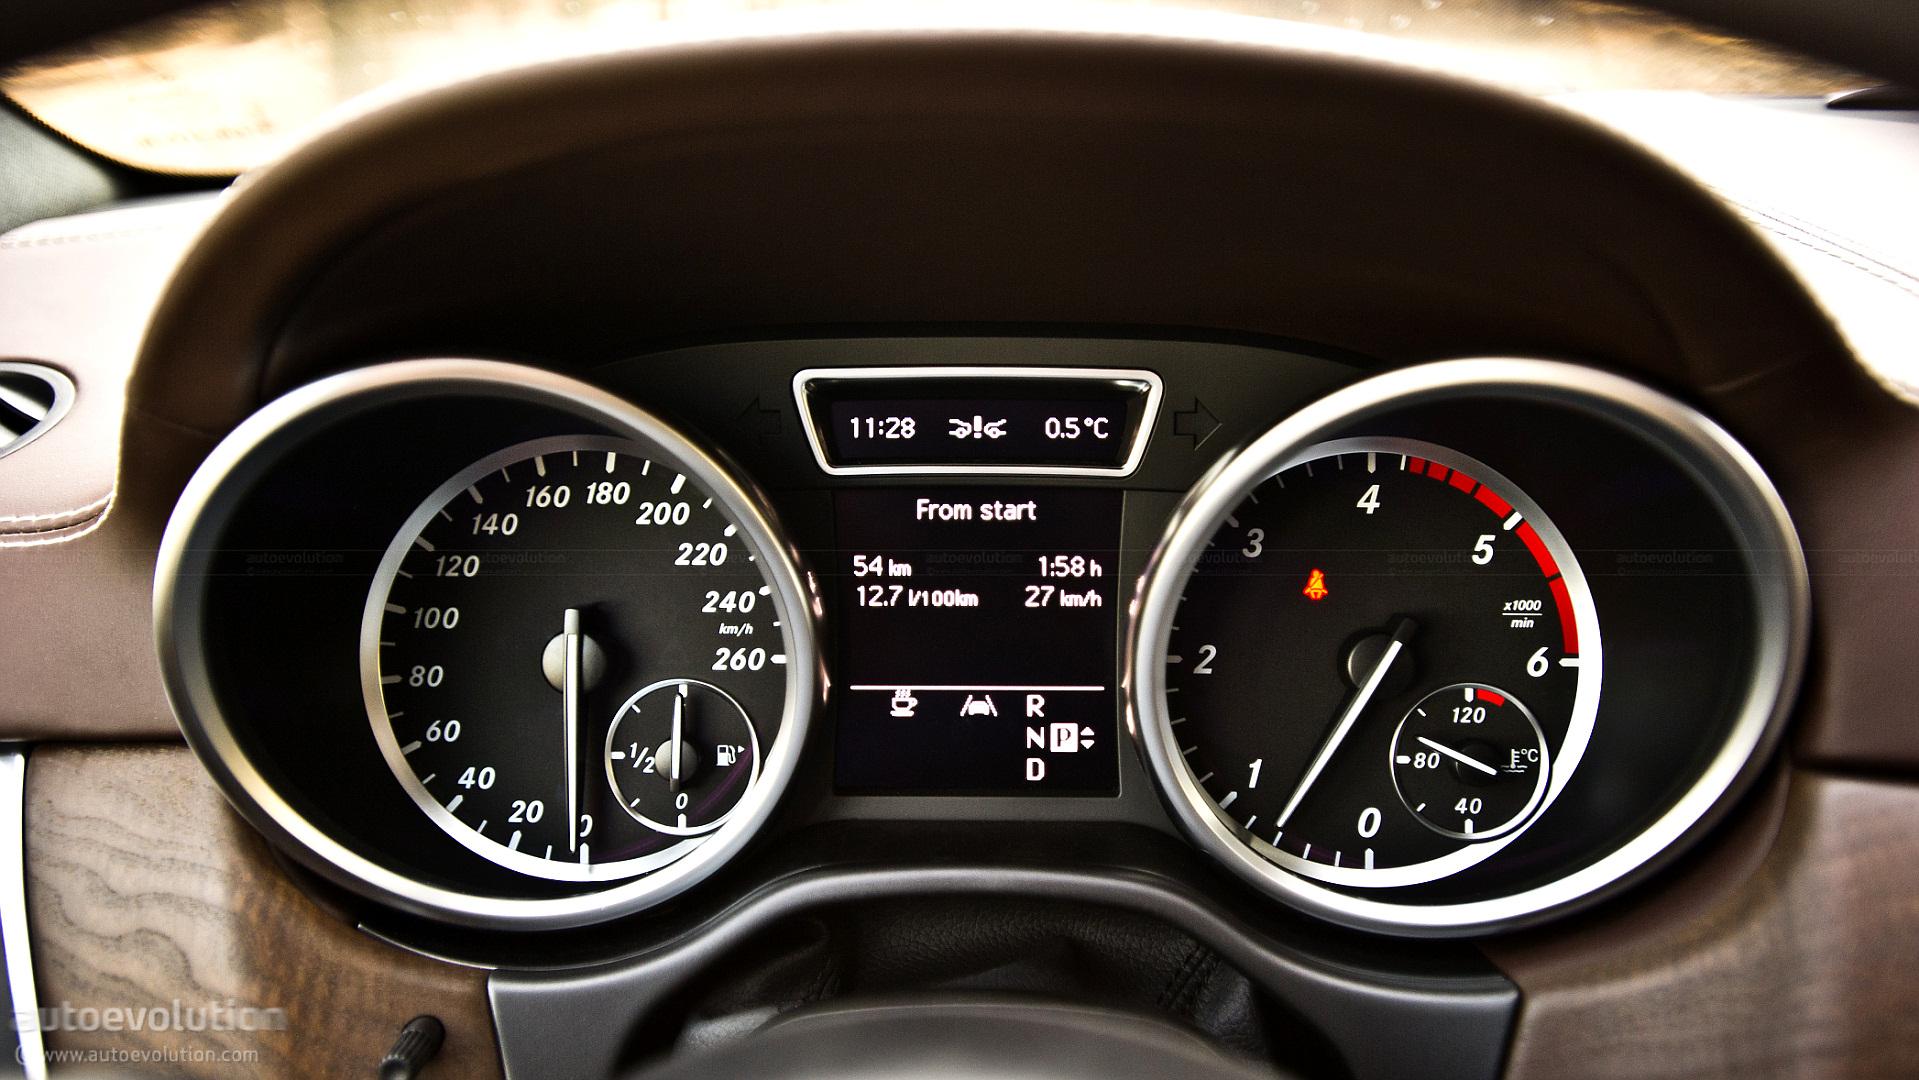 Ml 250 2012 ml350 bluetec problems autos post for Troubleshooting mercedes benz